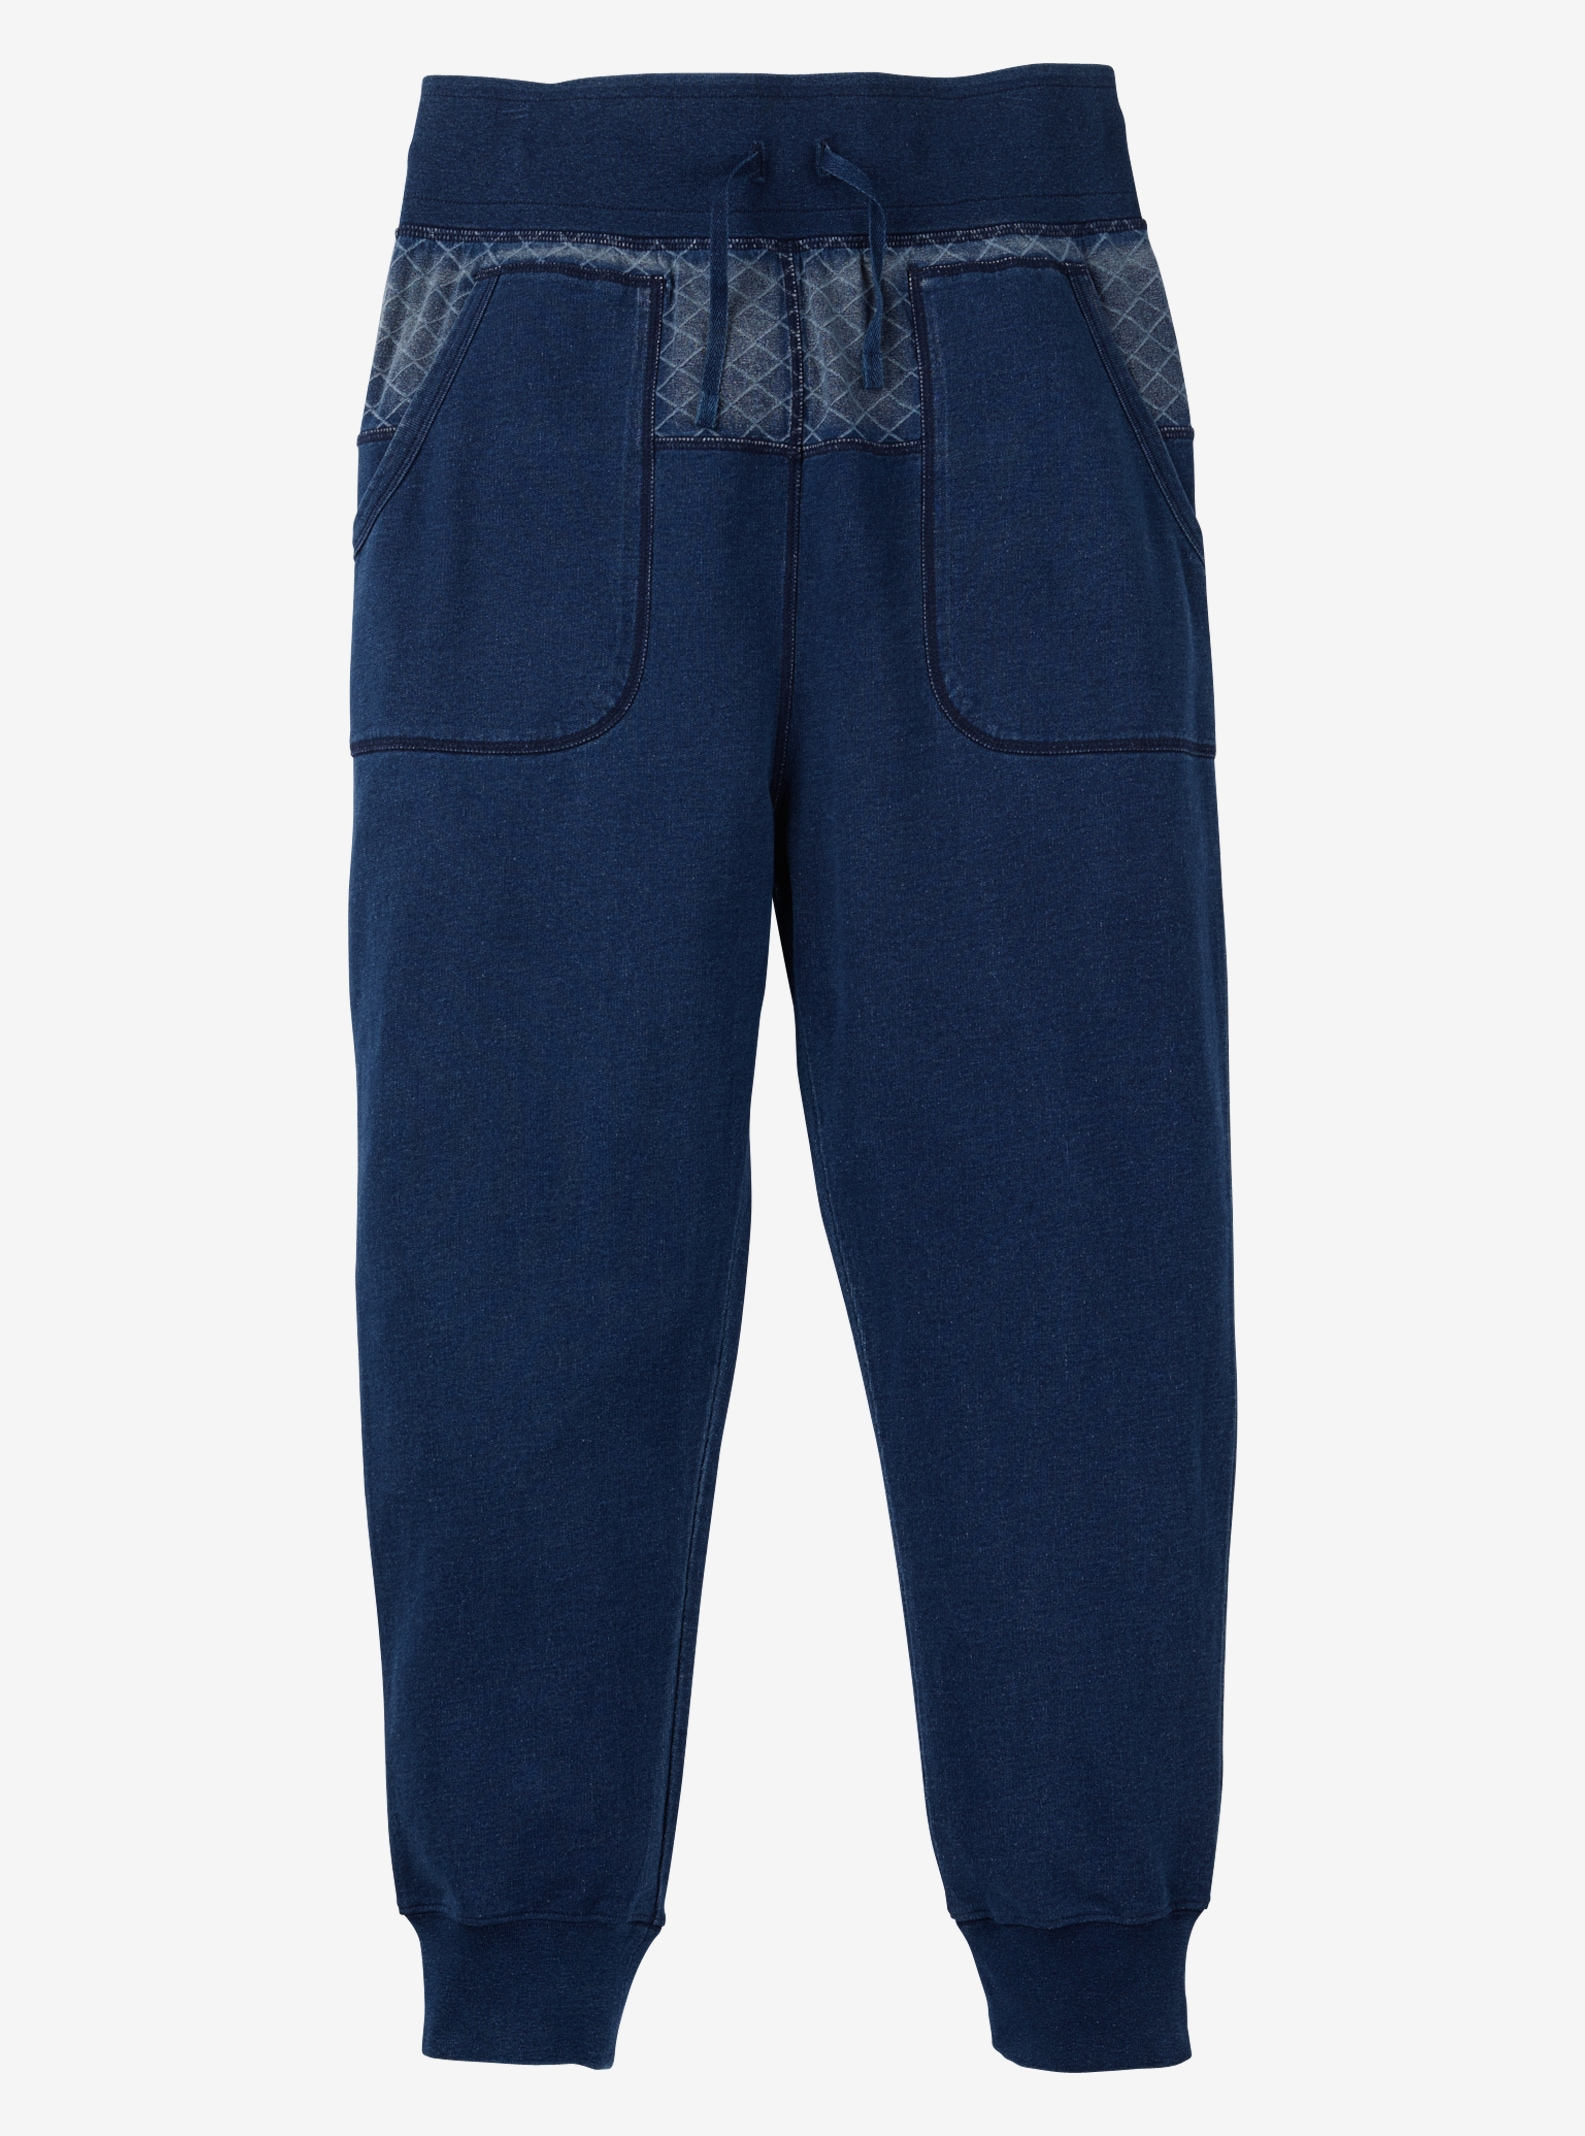 Burton Monhegan Fleece Pant shown in Indigo